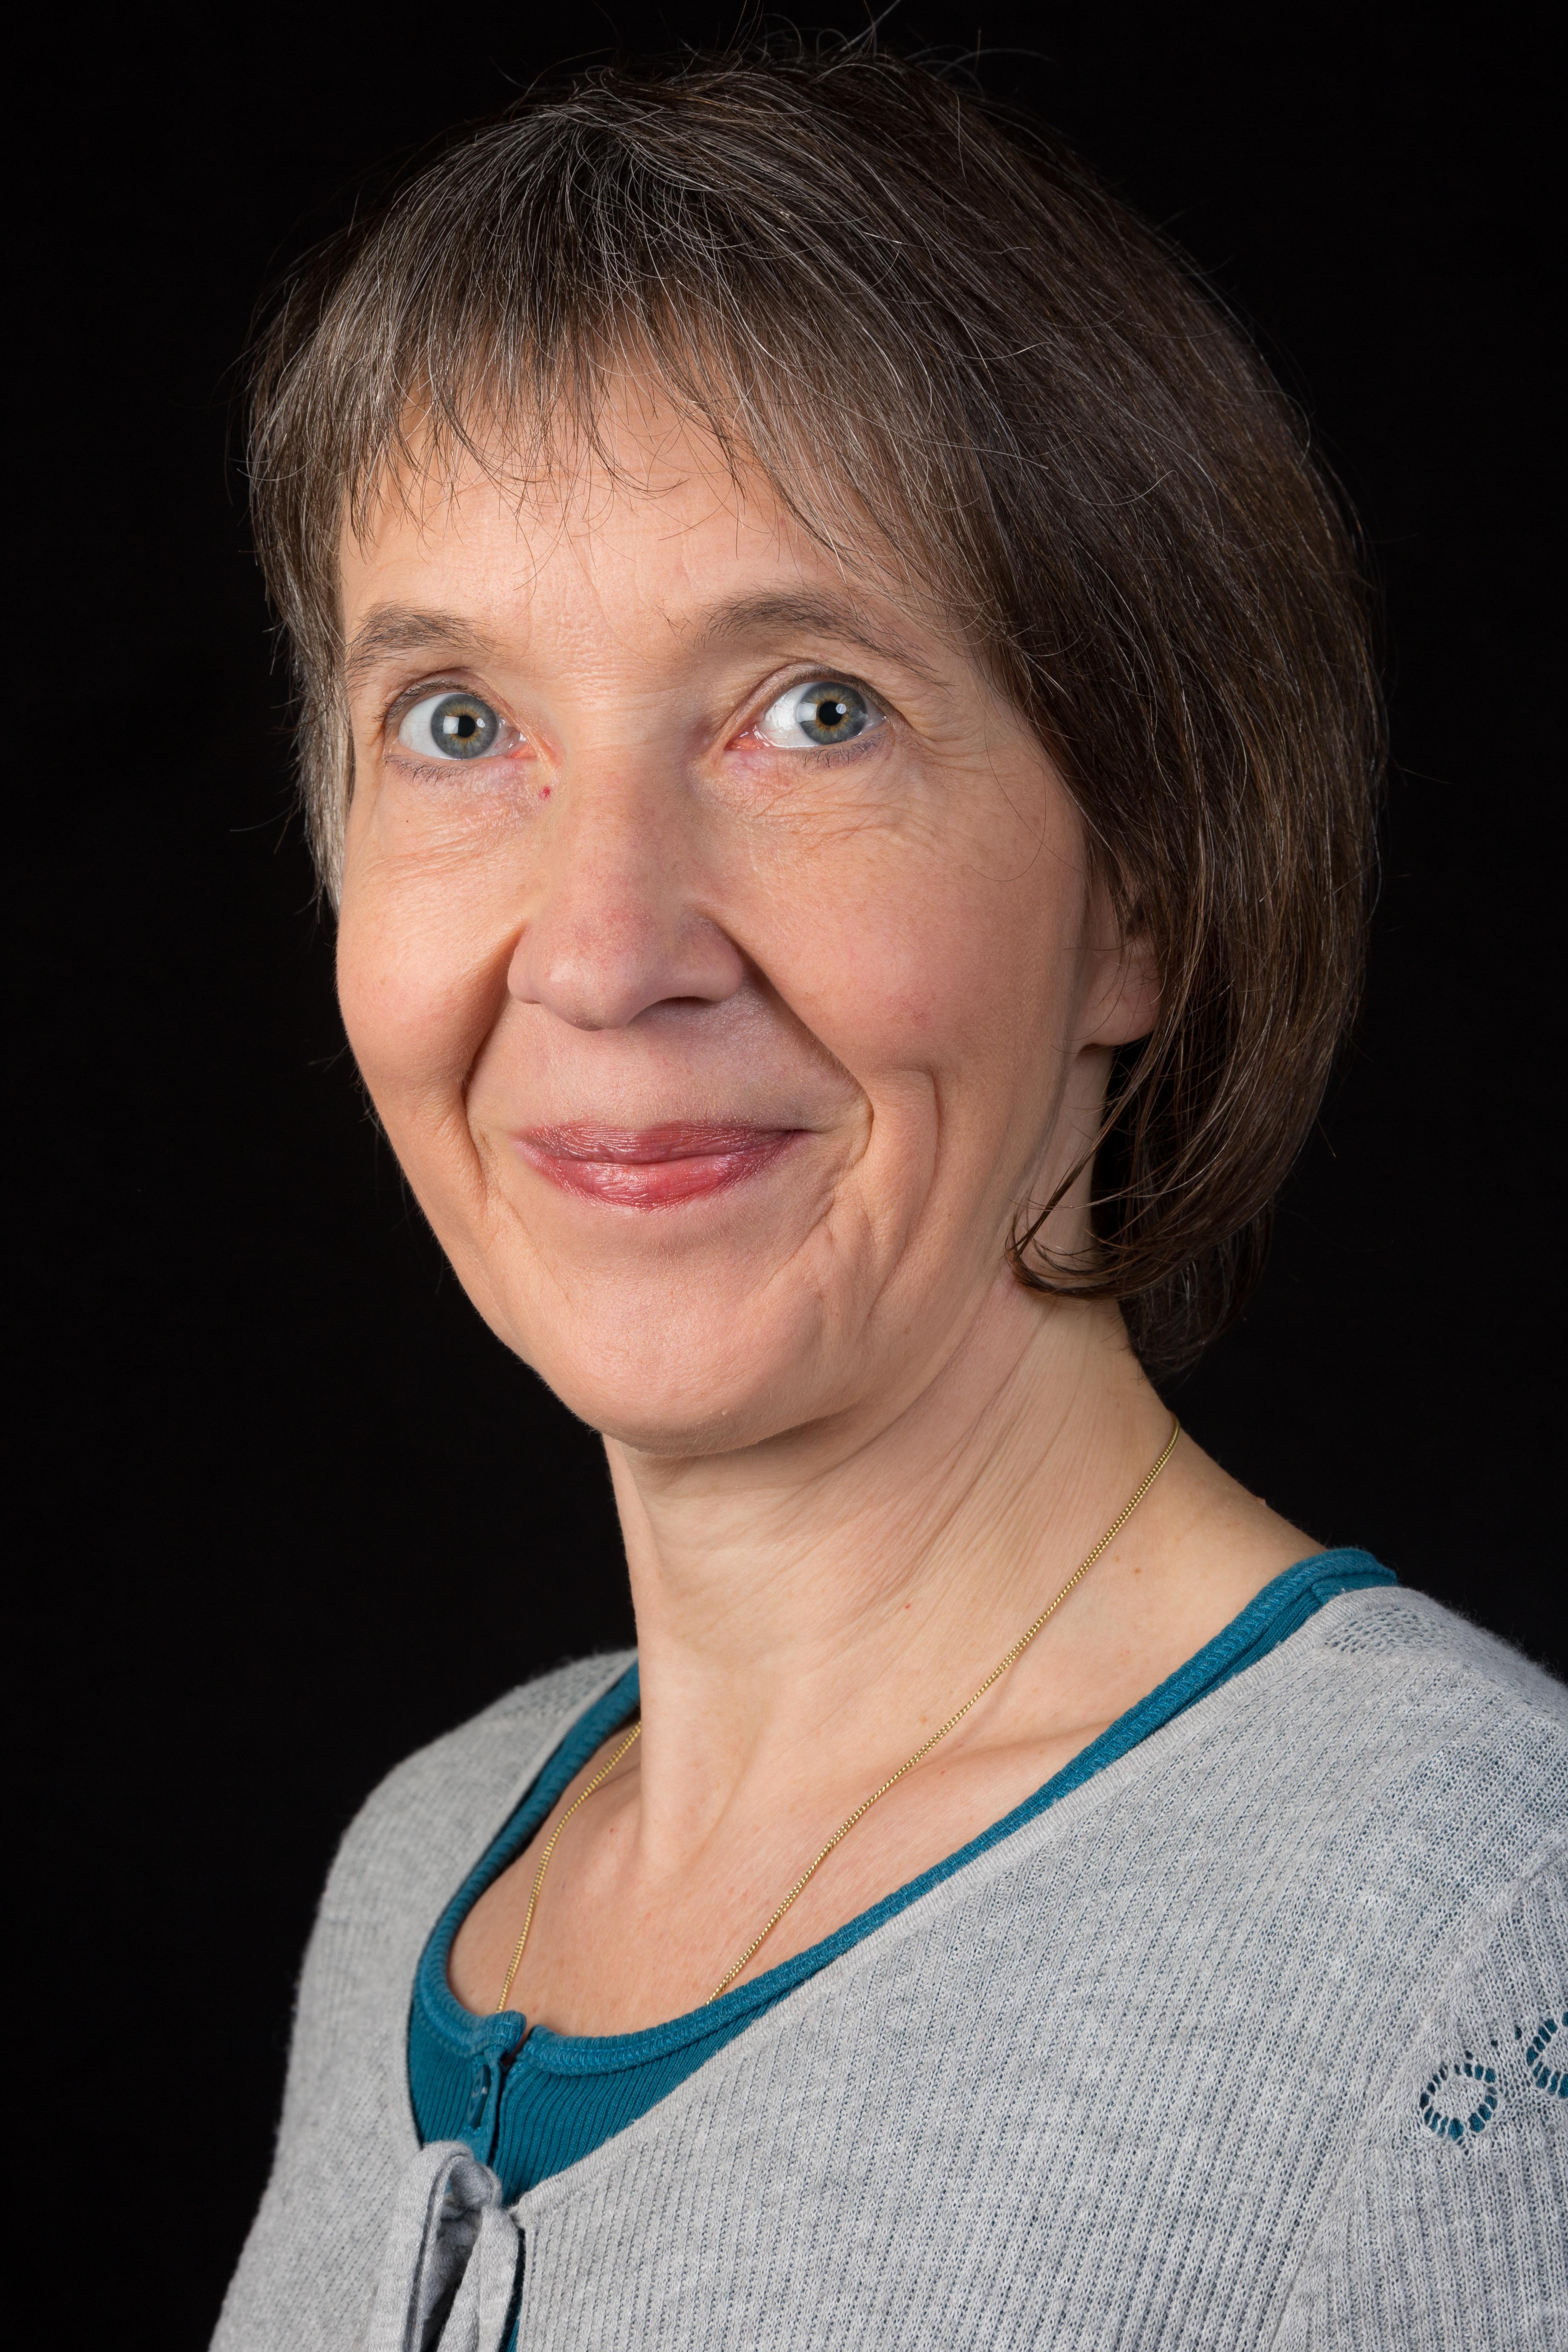 Lena Johannson